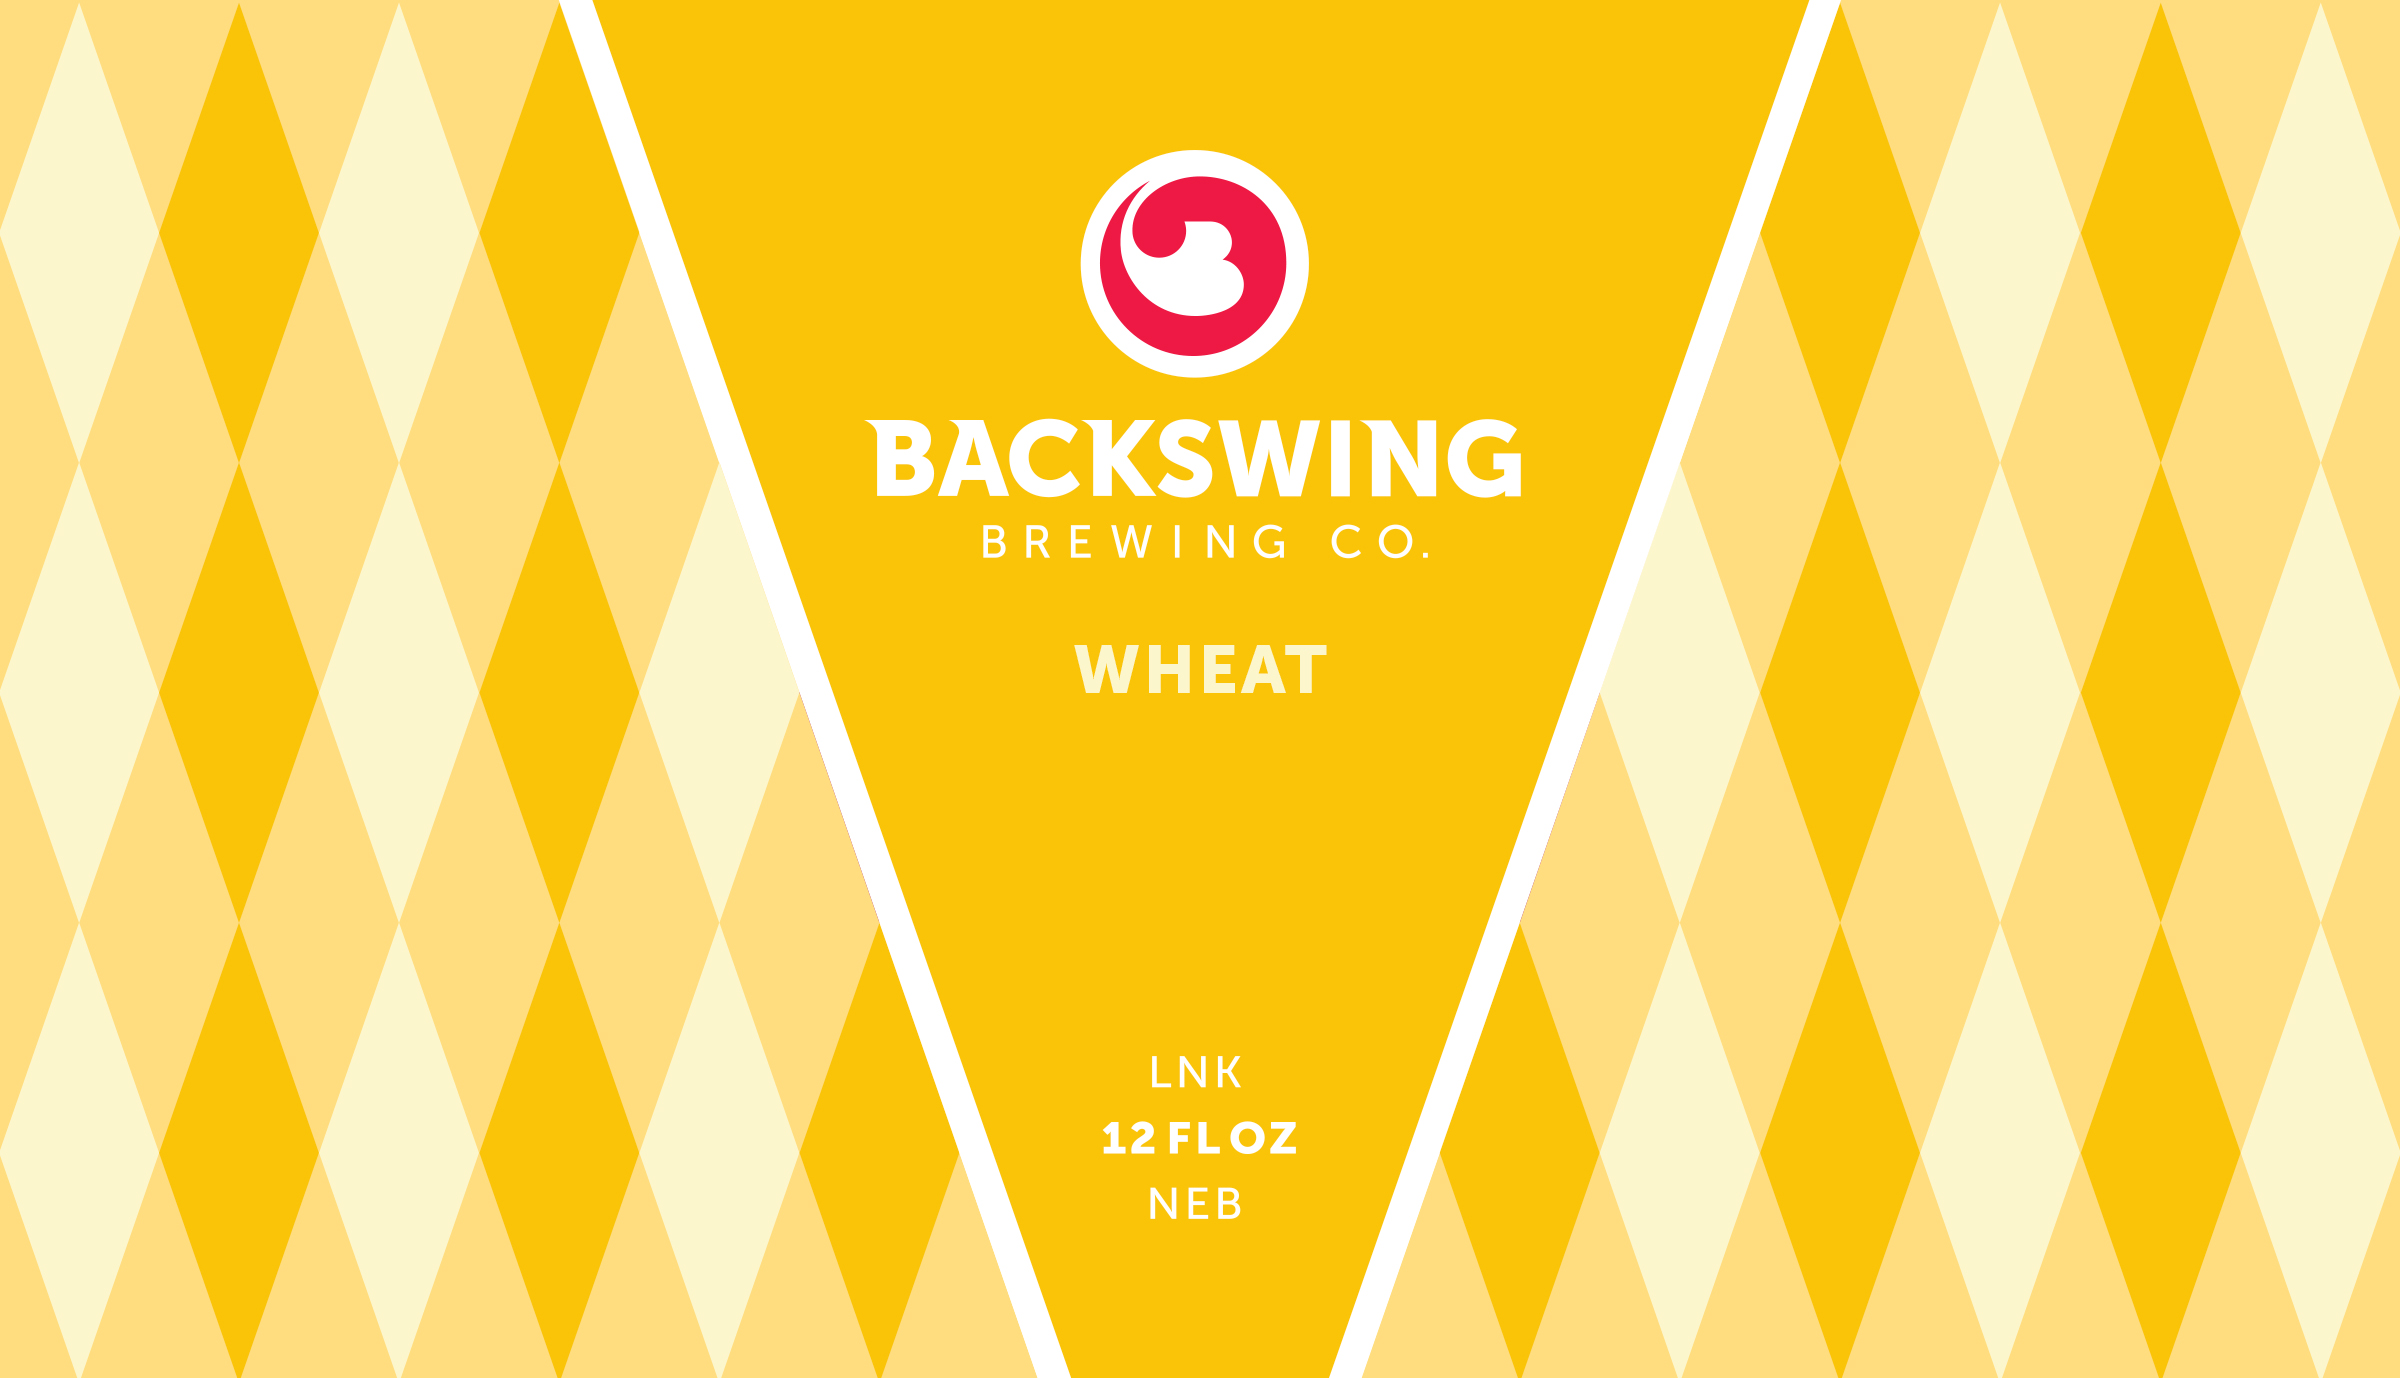 bsw-wheat-2400.jpg